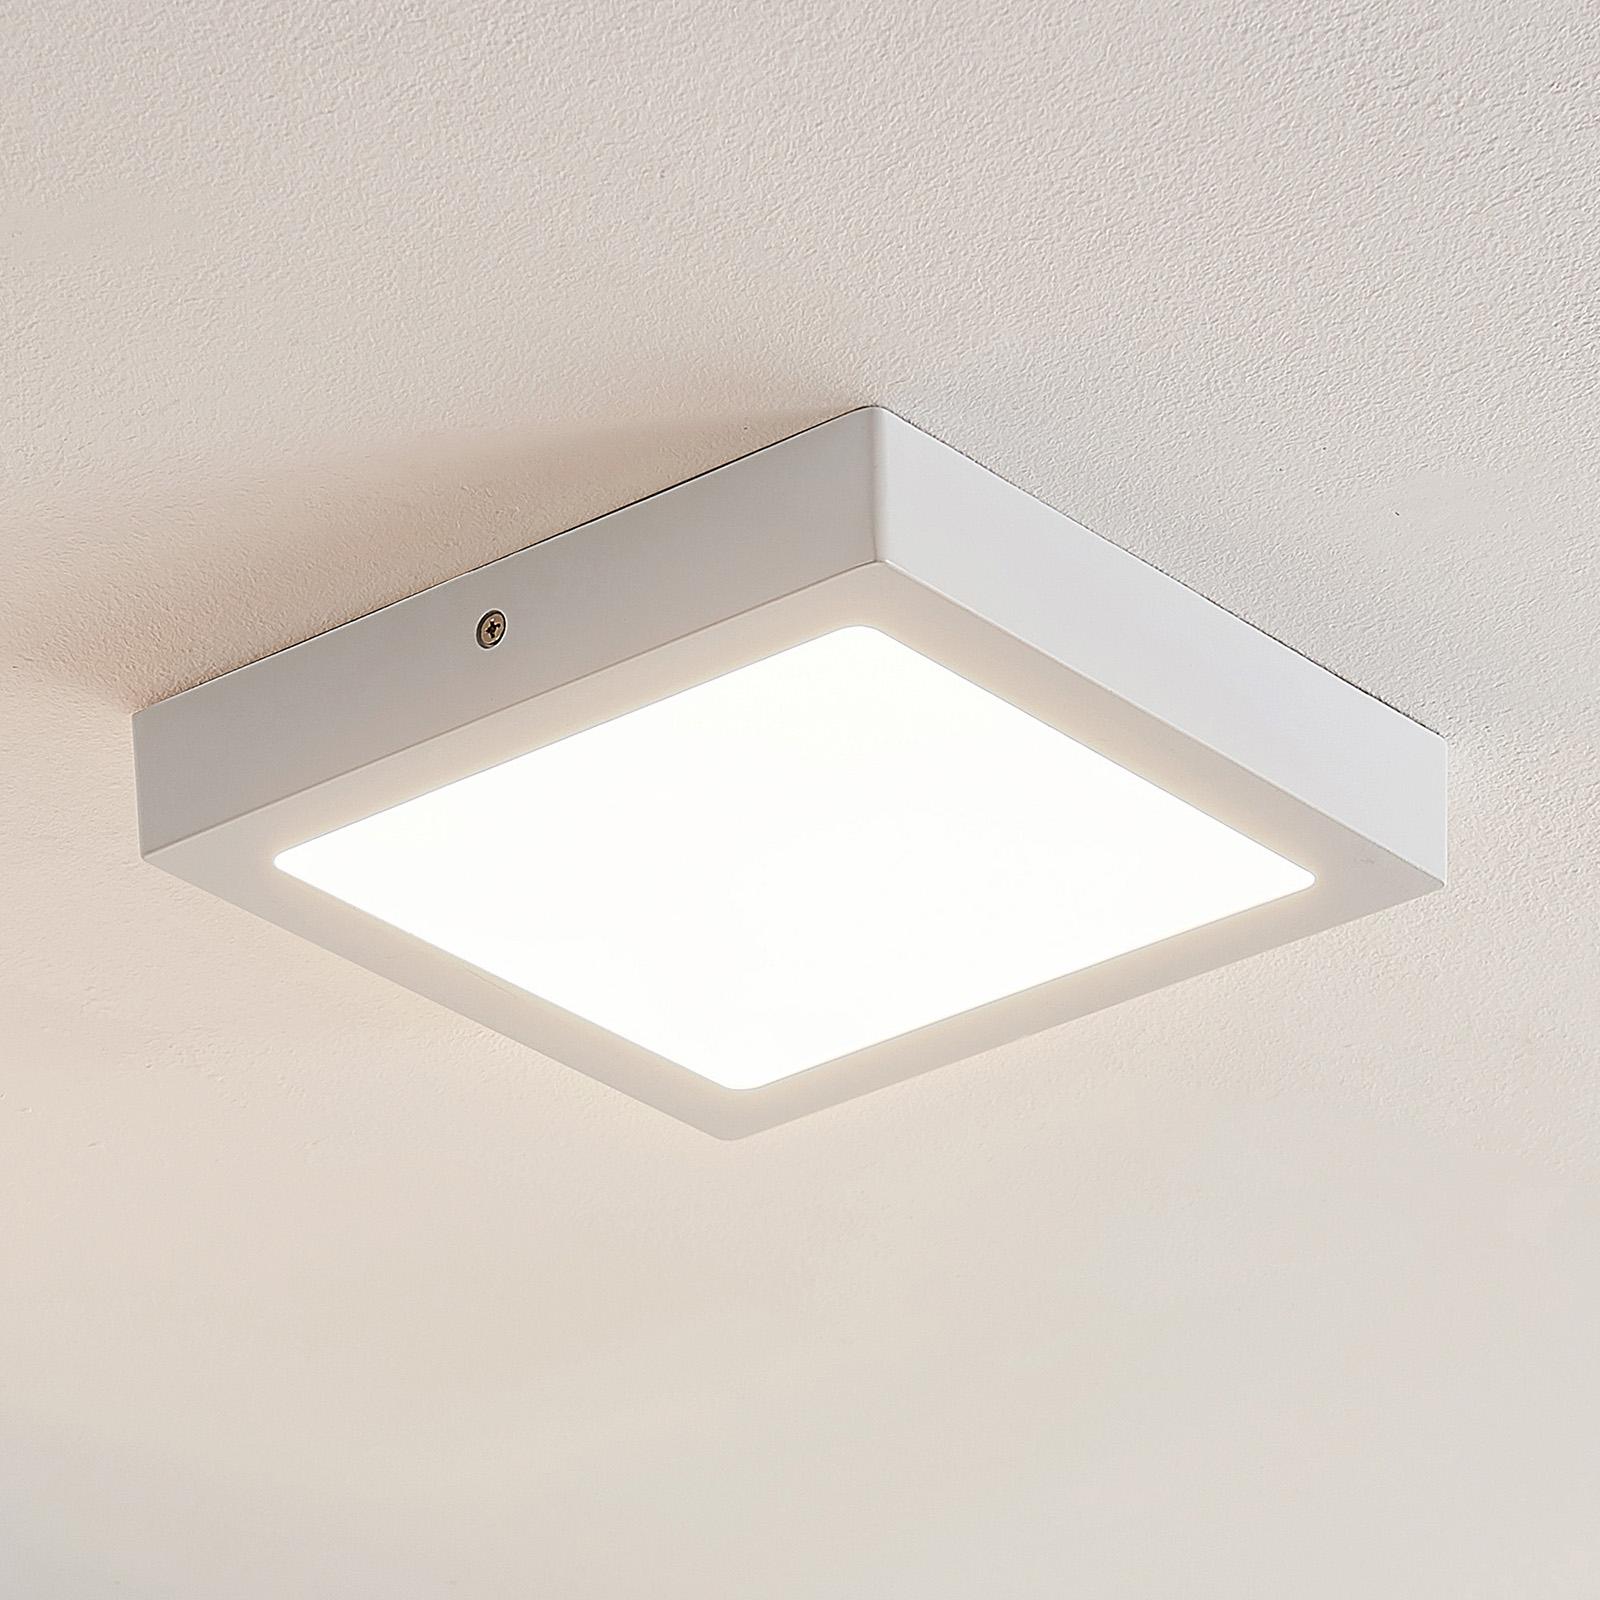 ELC Merina lampa sufitowa LED biała, 21,5 x 21,5cm